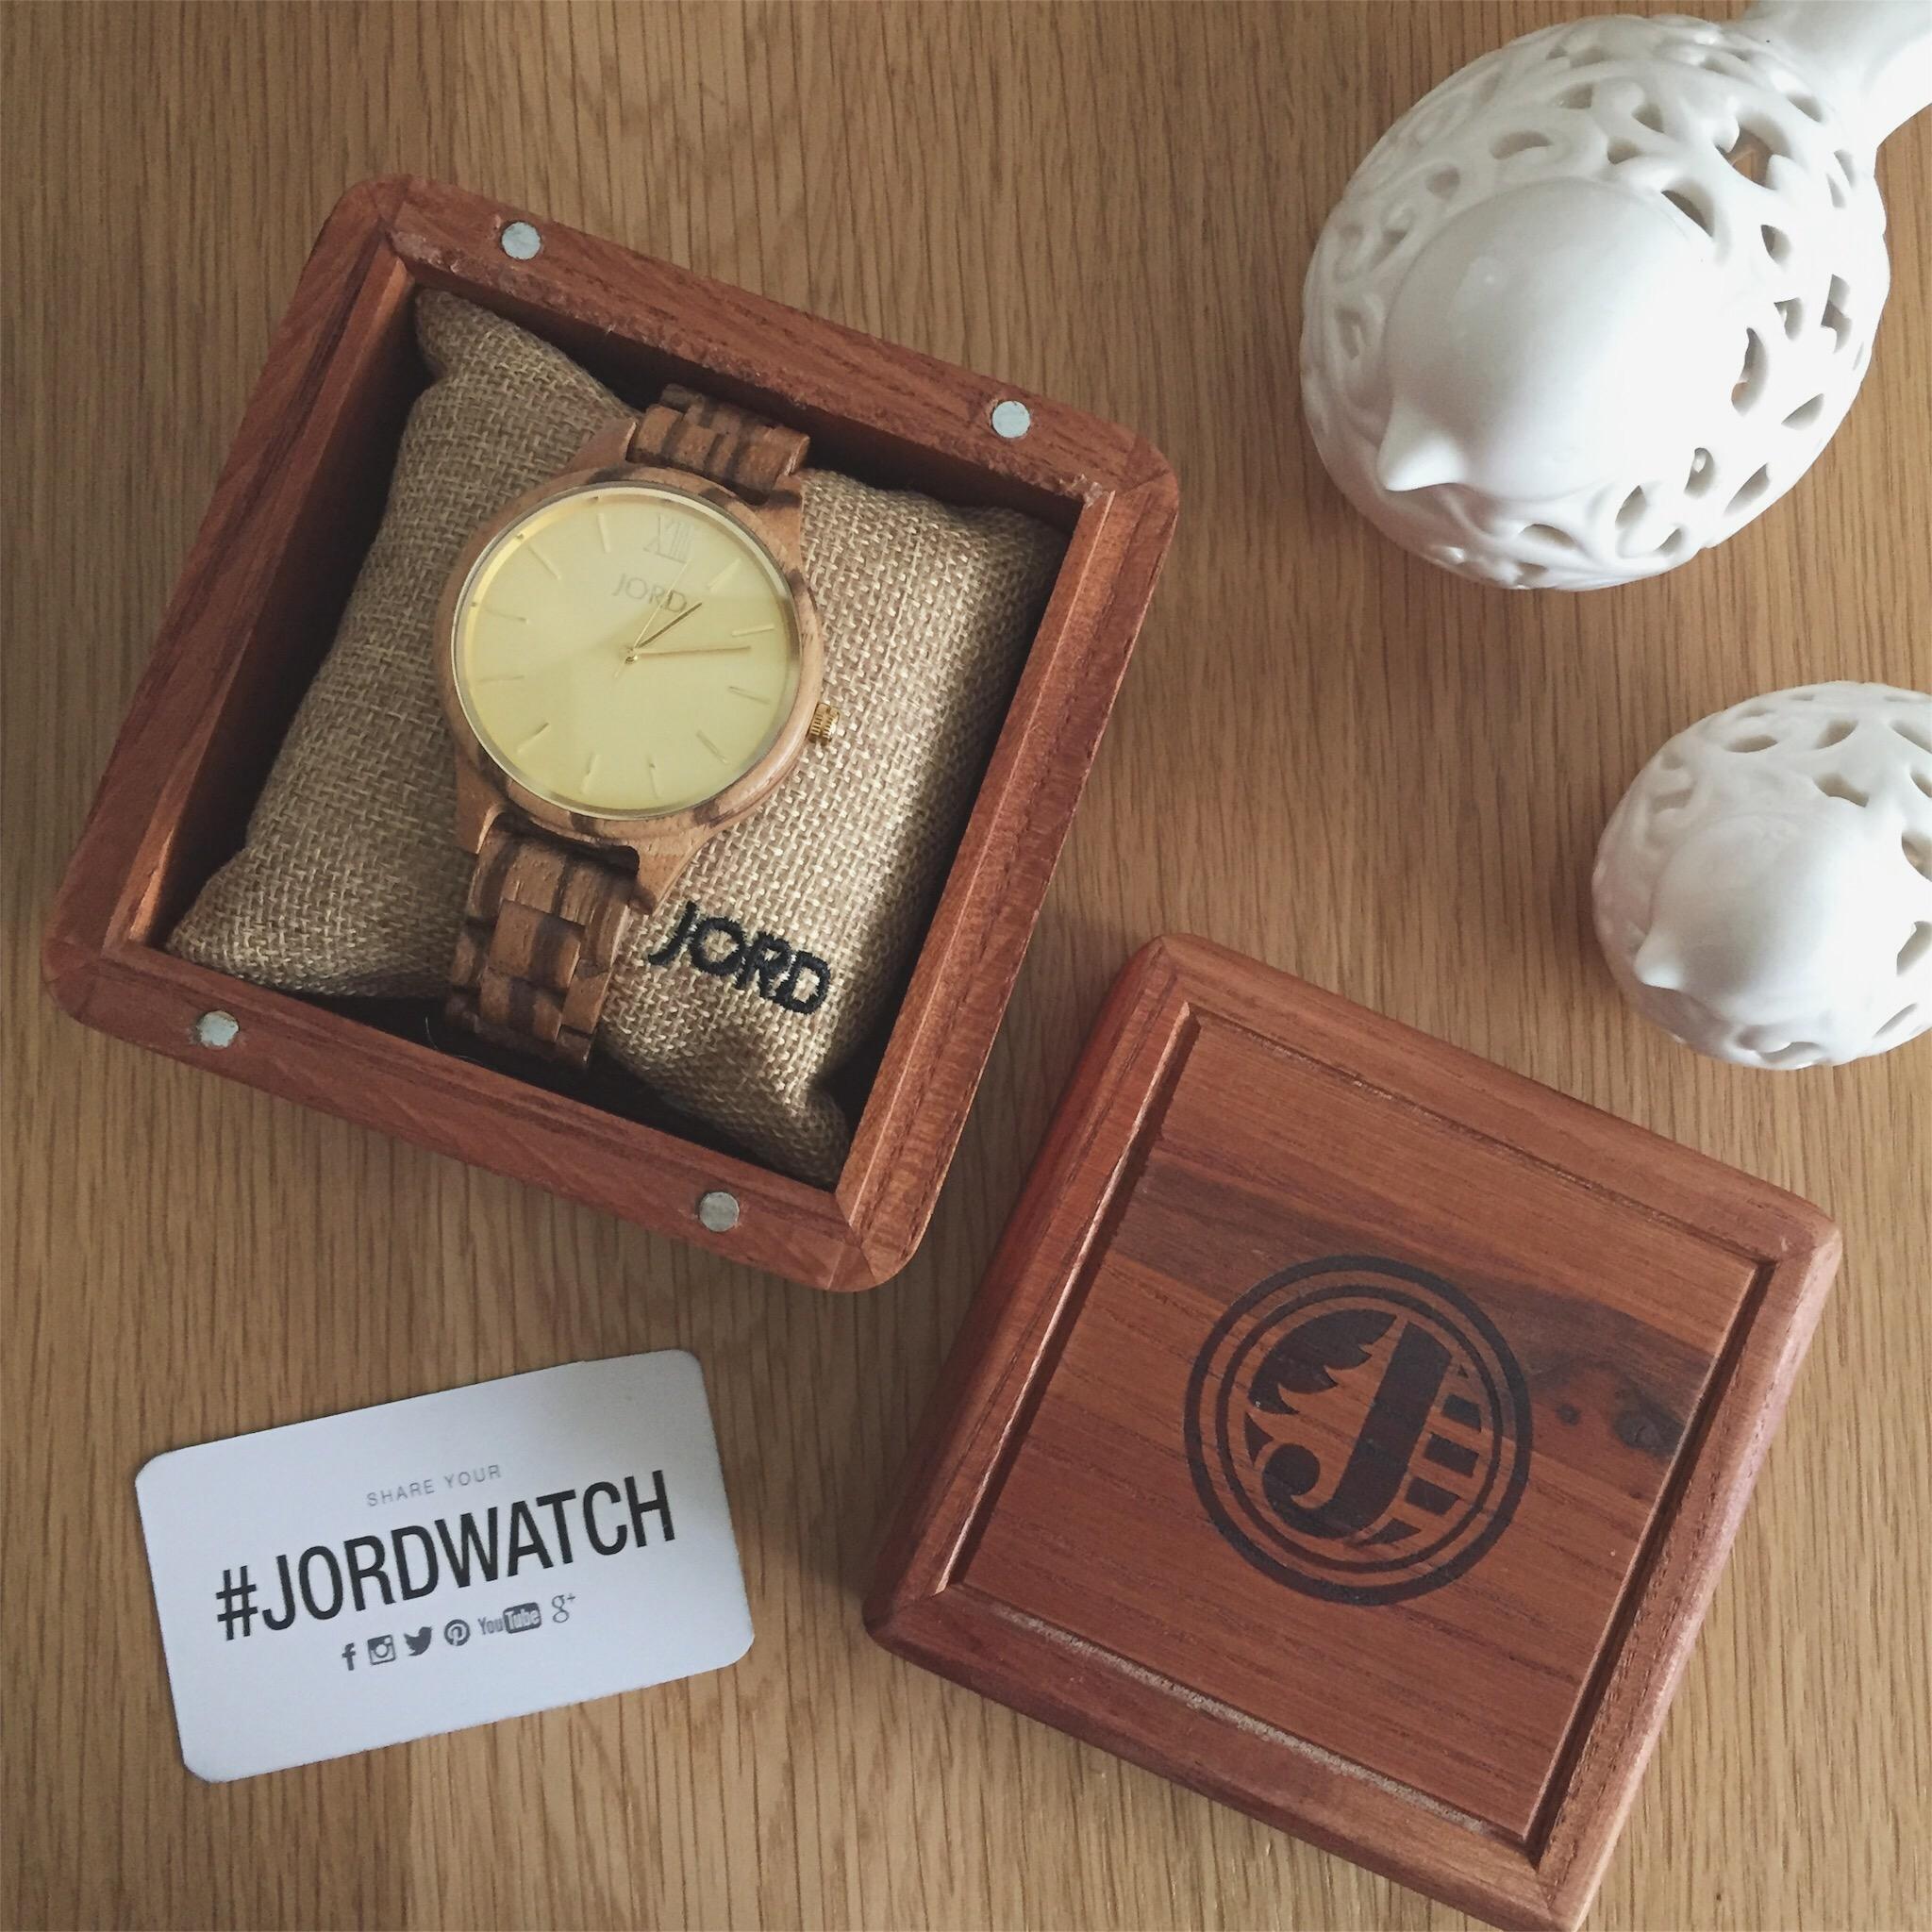 jord watch, wooden watch